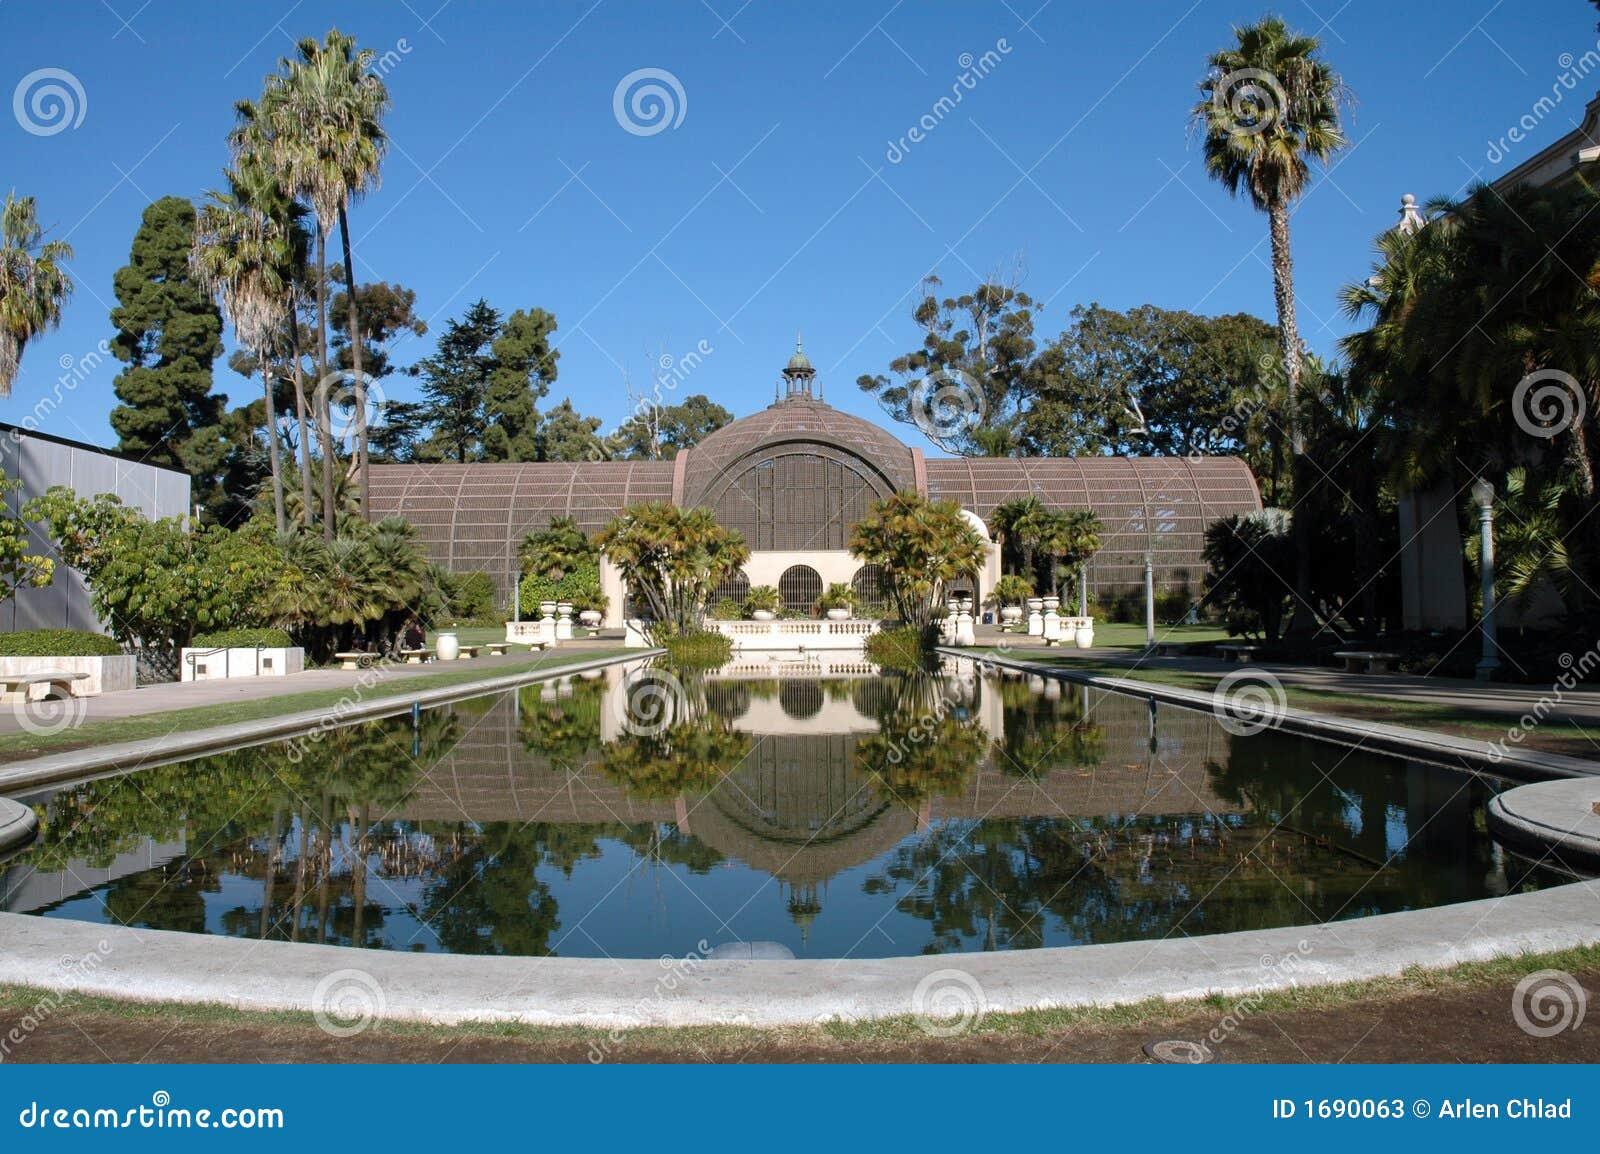 Balboa ca park San Diego